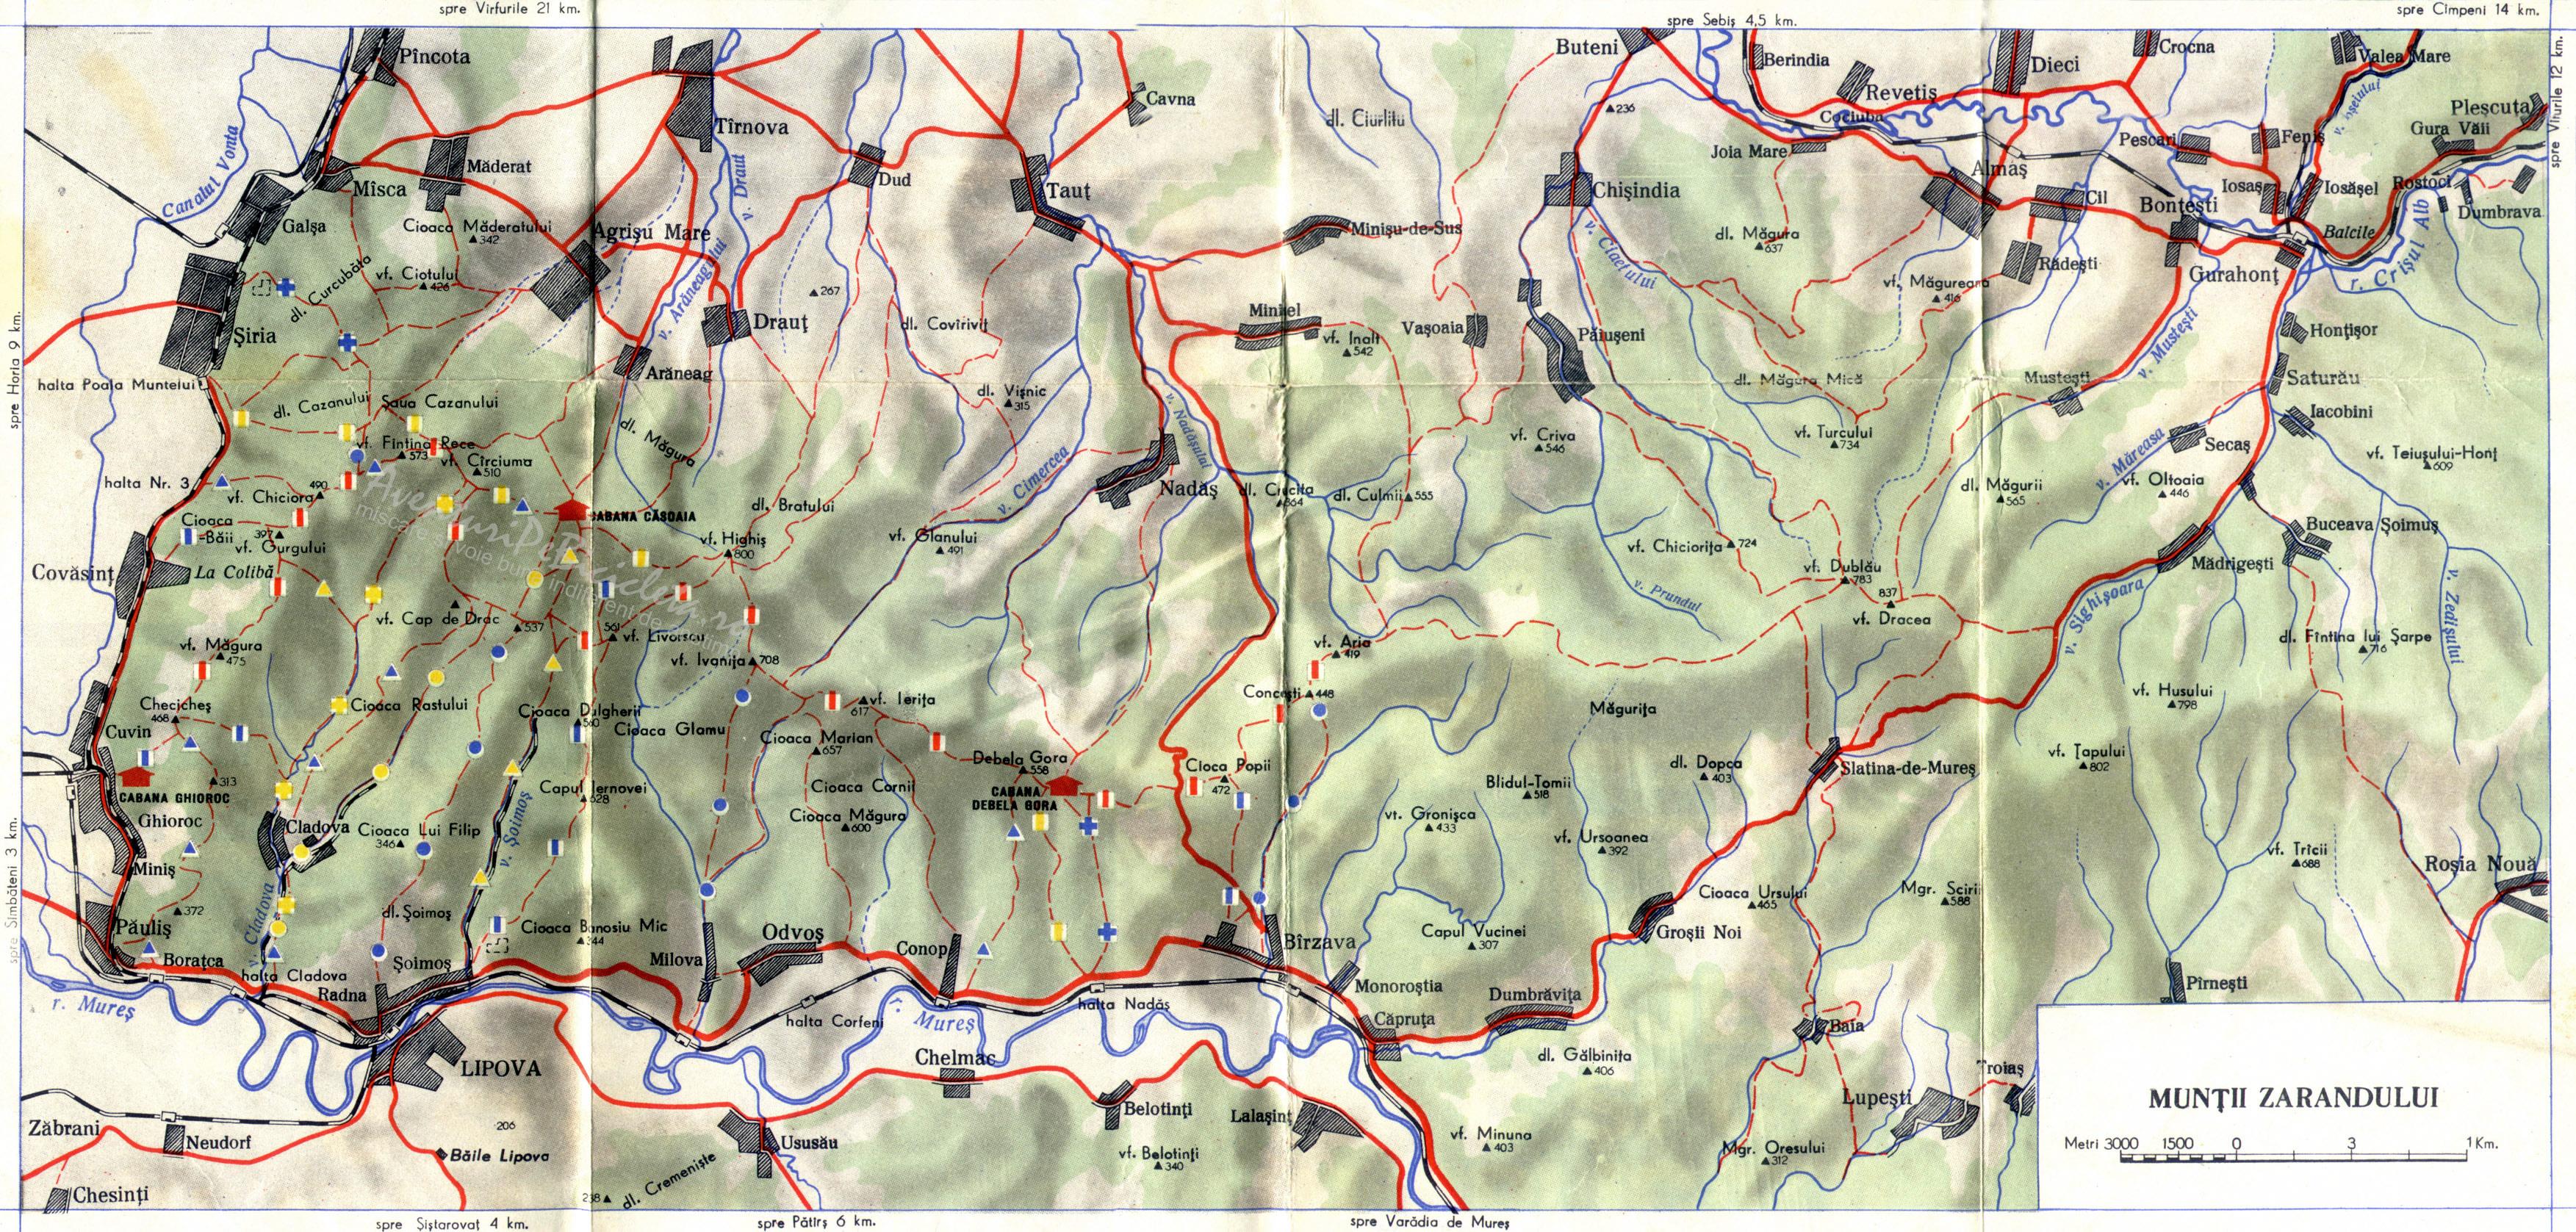 Harta Muntii Zarandului - Aventuri pe bicicleta